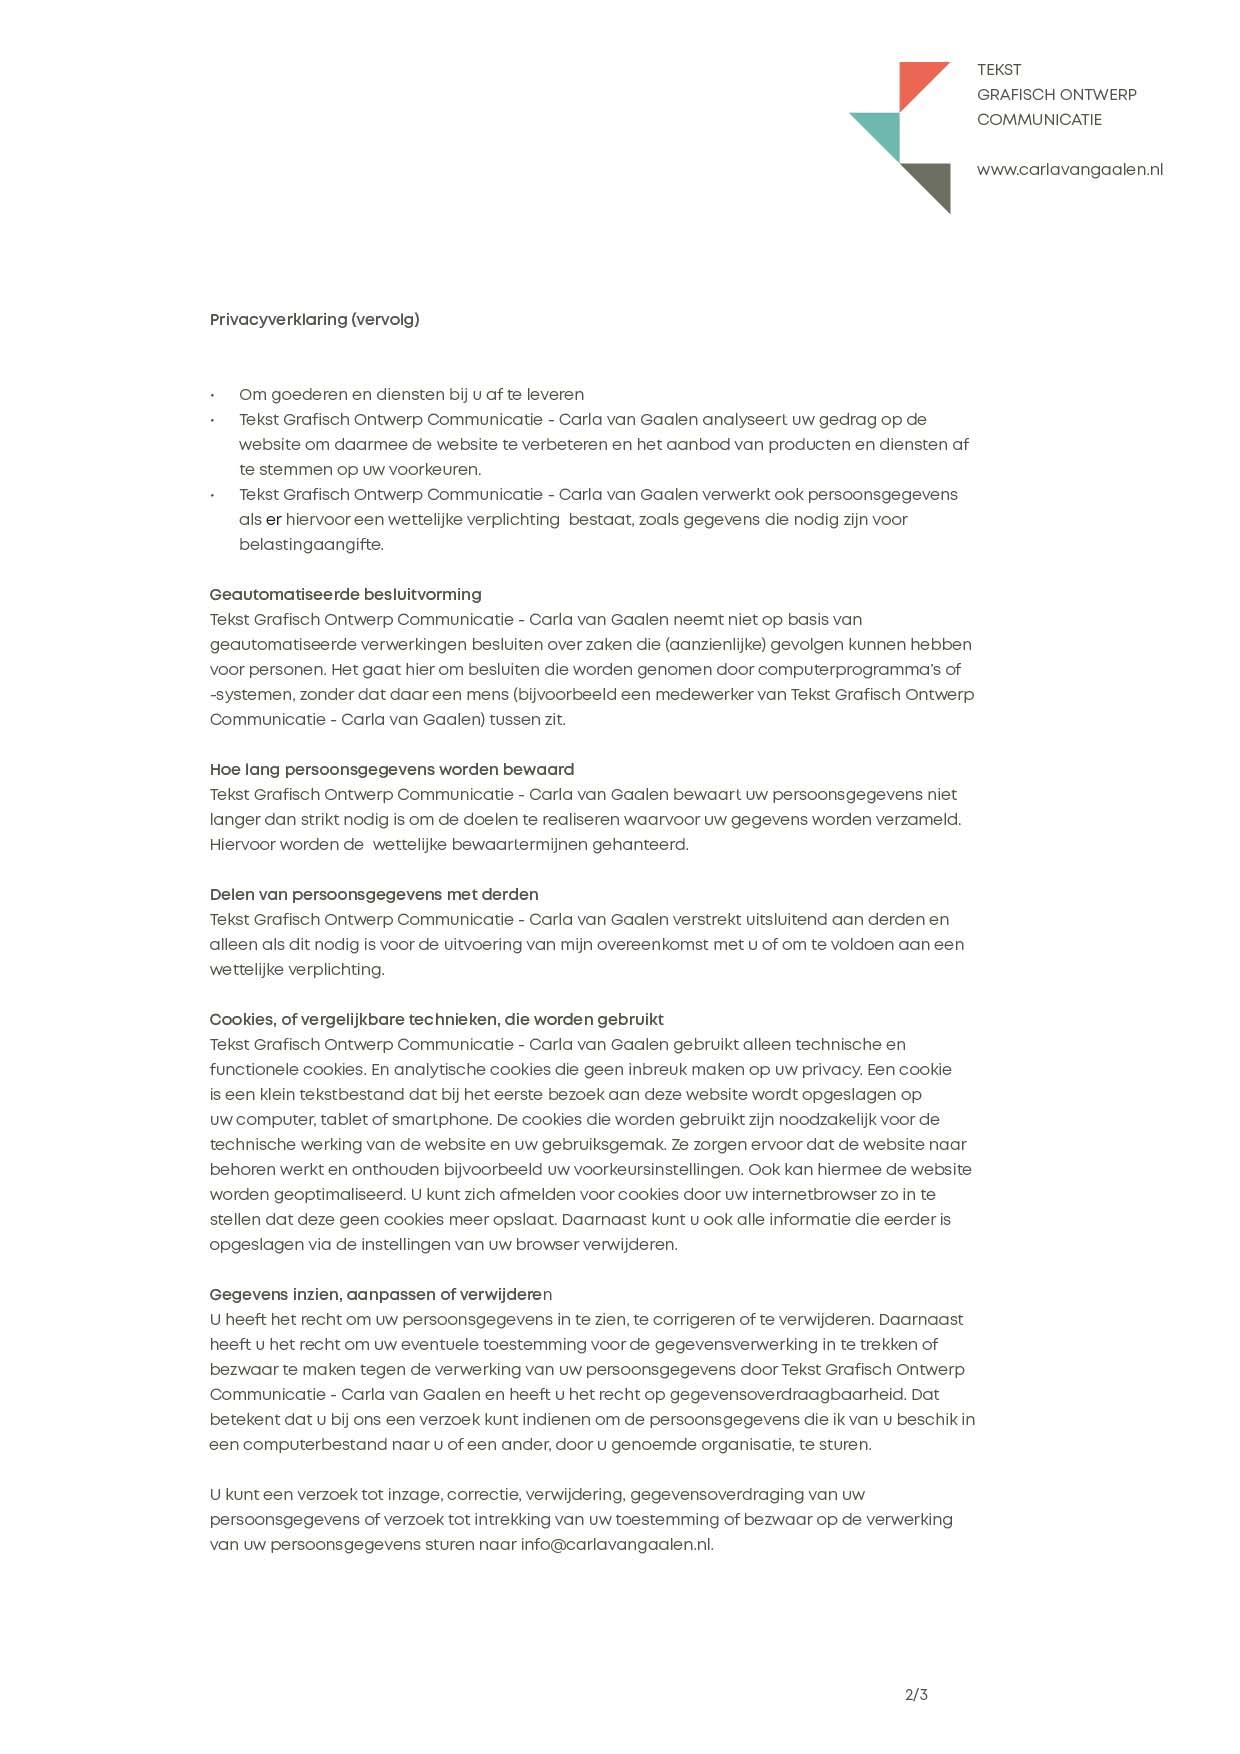 privacyverklaring-2